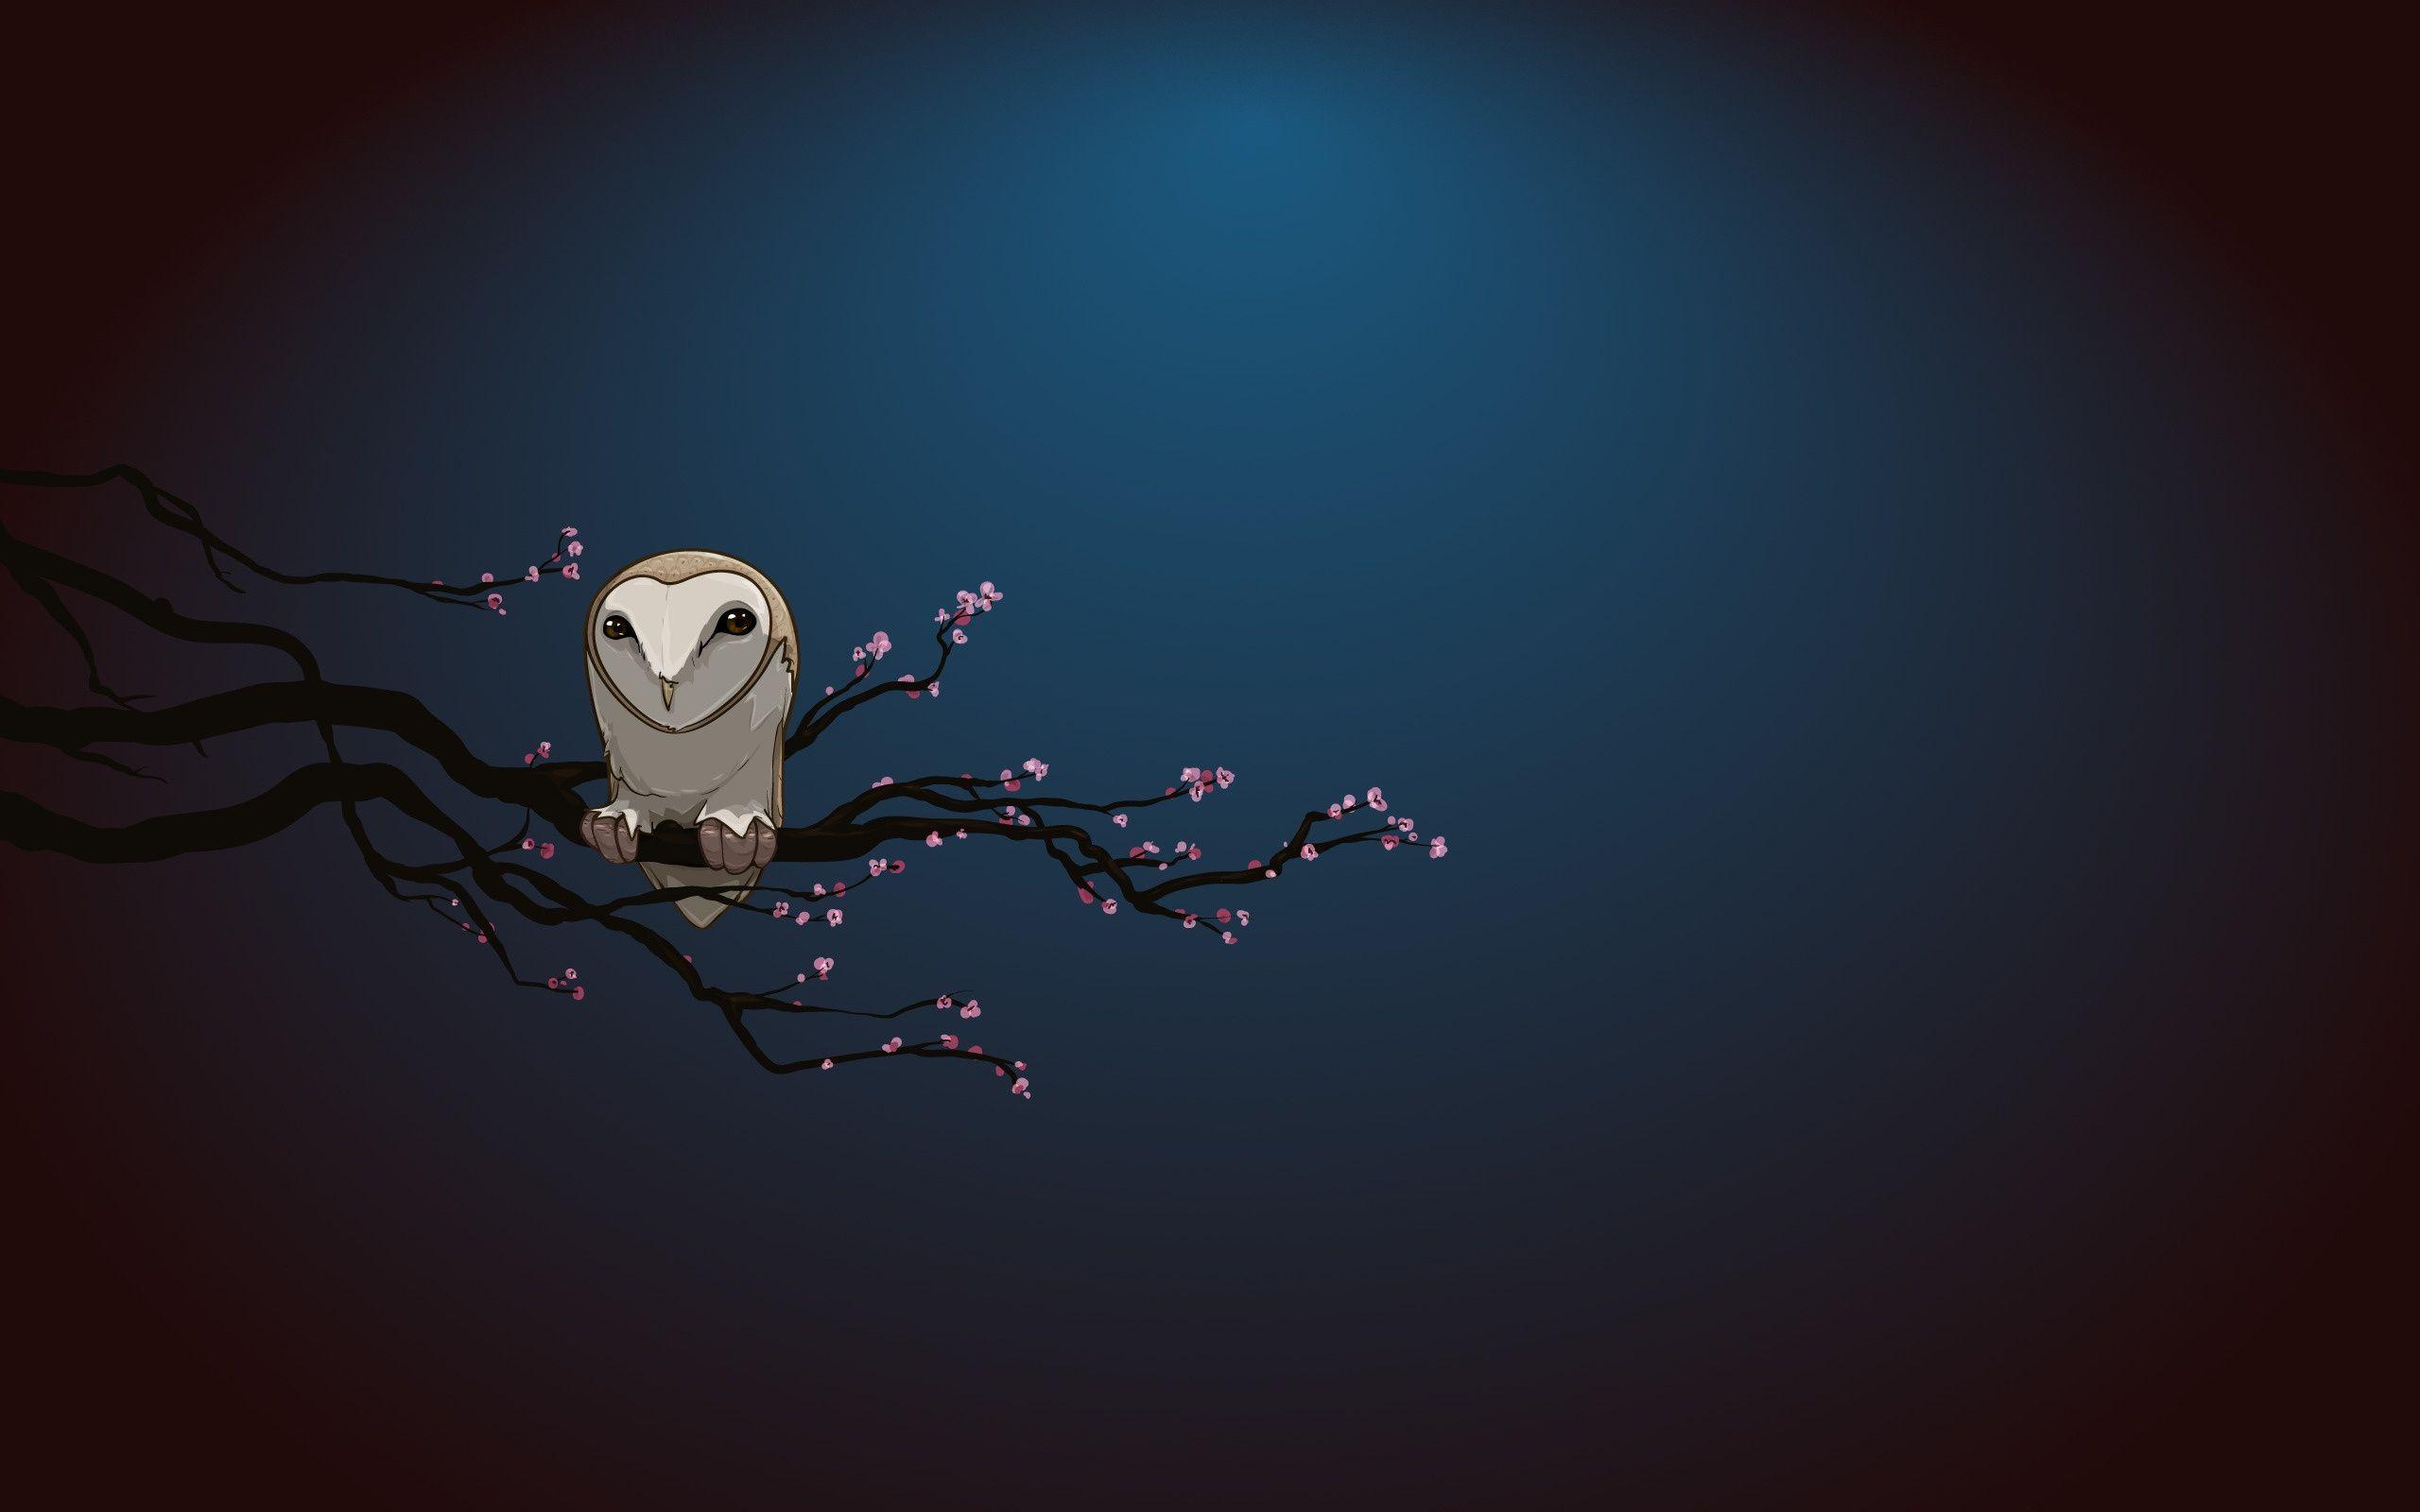 2560x1600 Wallpaper Owl Branch Night Owl Wallpaper Art Wallpaper Art Wallpaper Iphone